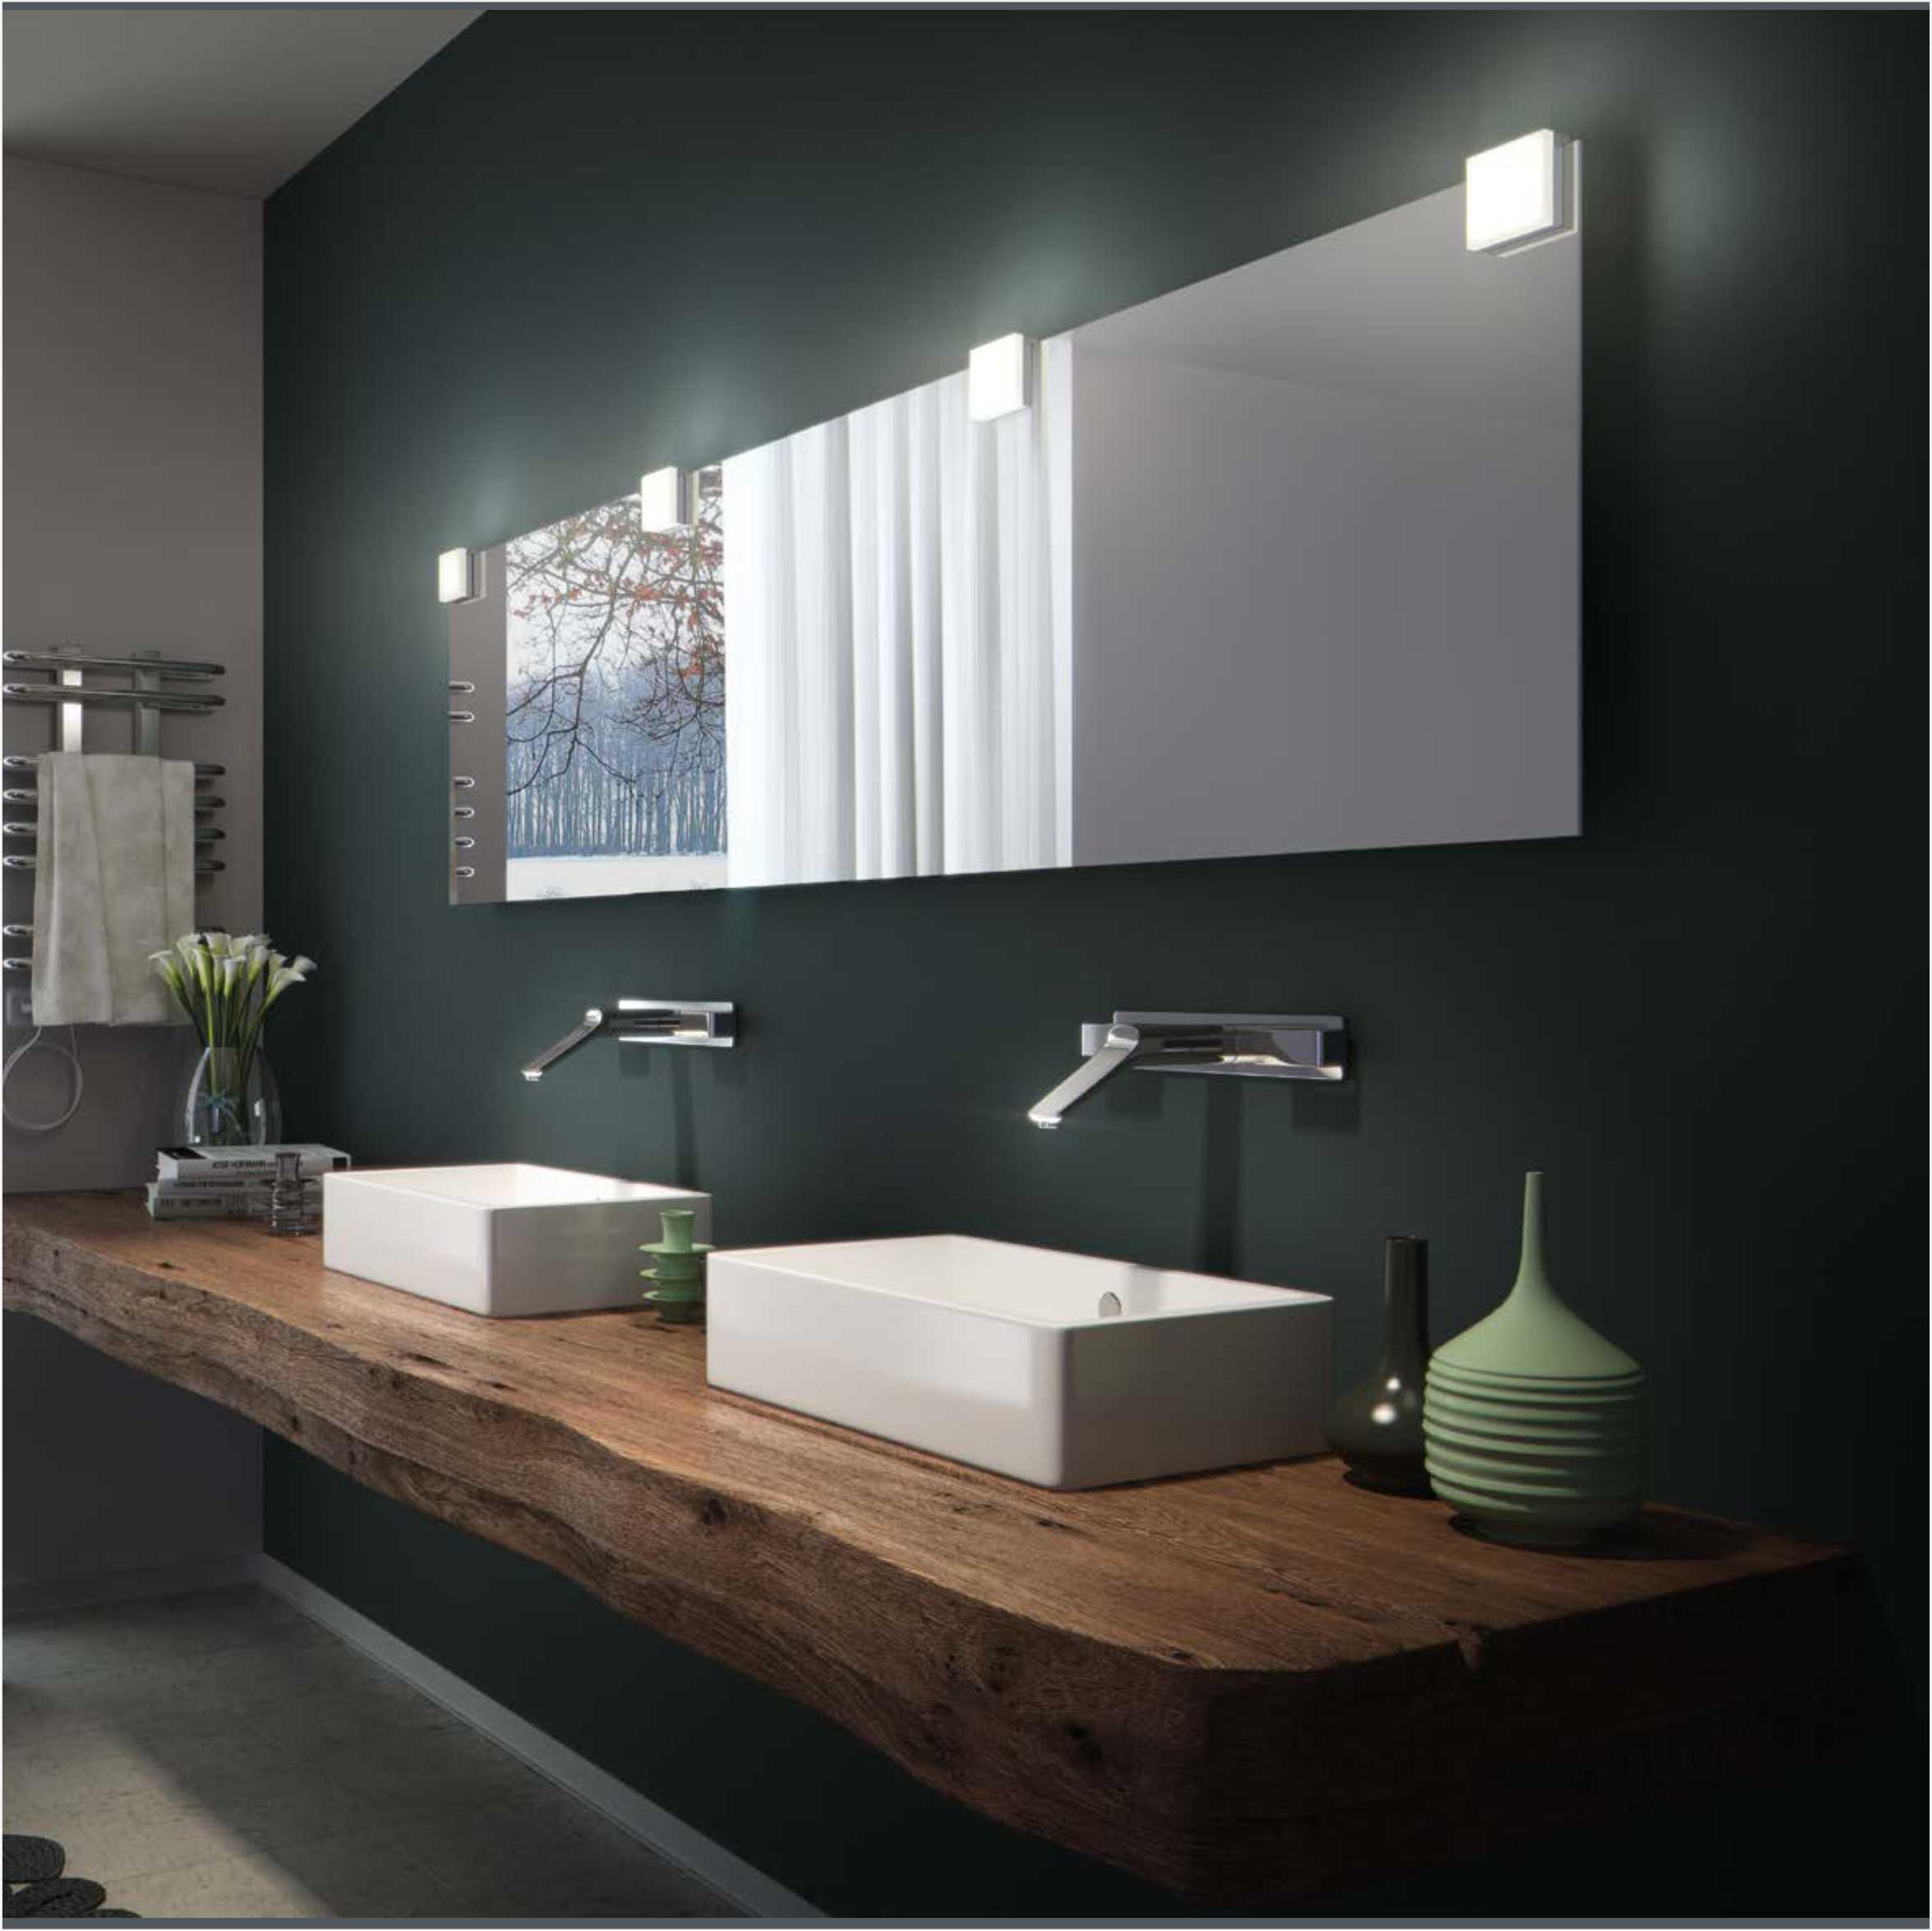 Latest Product Square LED Bathroom Mirror Light 2556